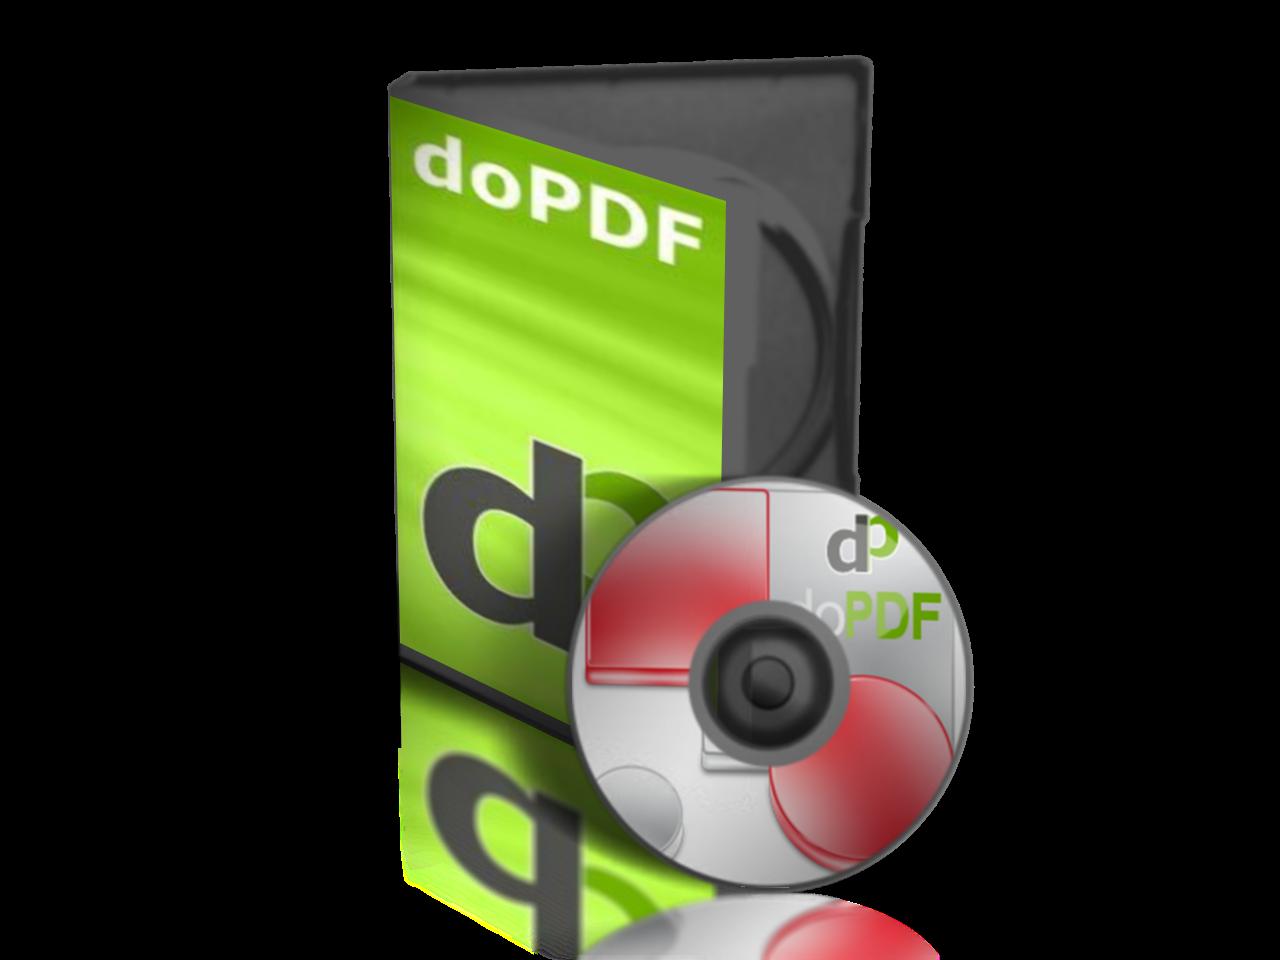 Convertir PDF a JPG Convierte online PDF a im genes gratis